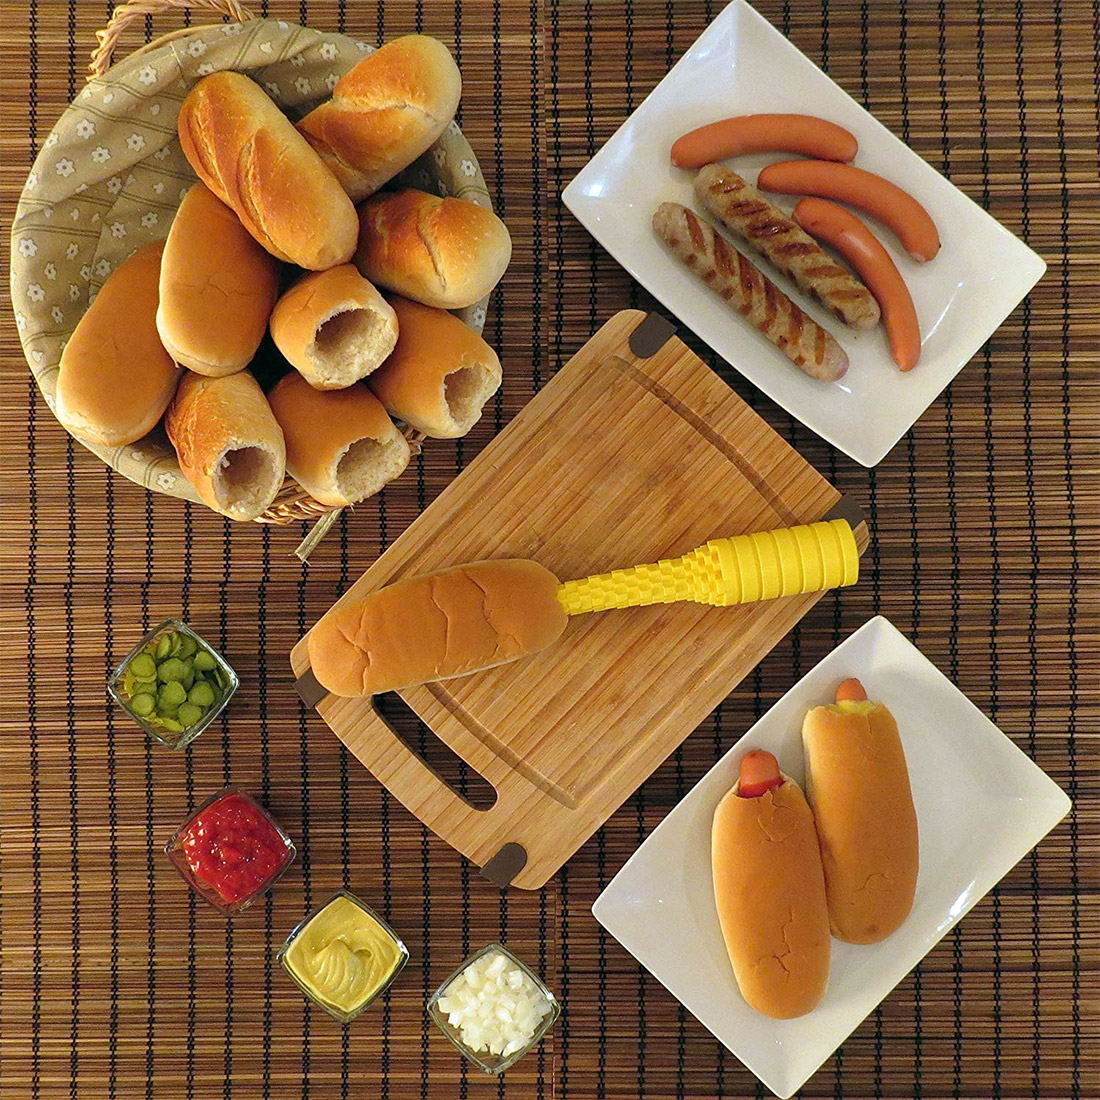 Hotdogger: the Ultimate Hot Dog Bun Driller